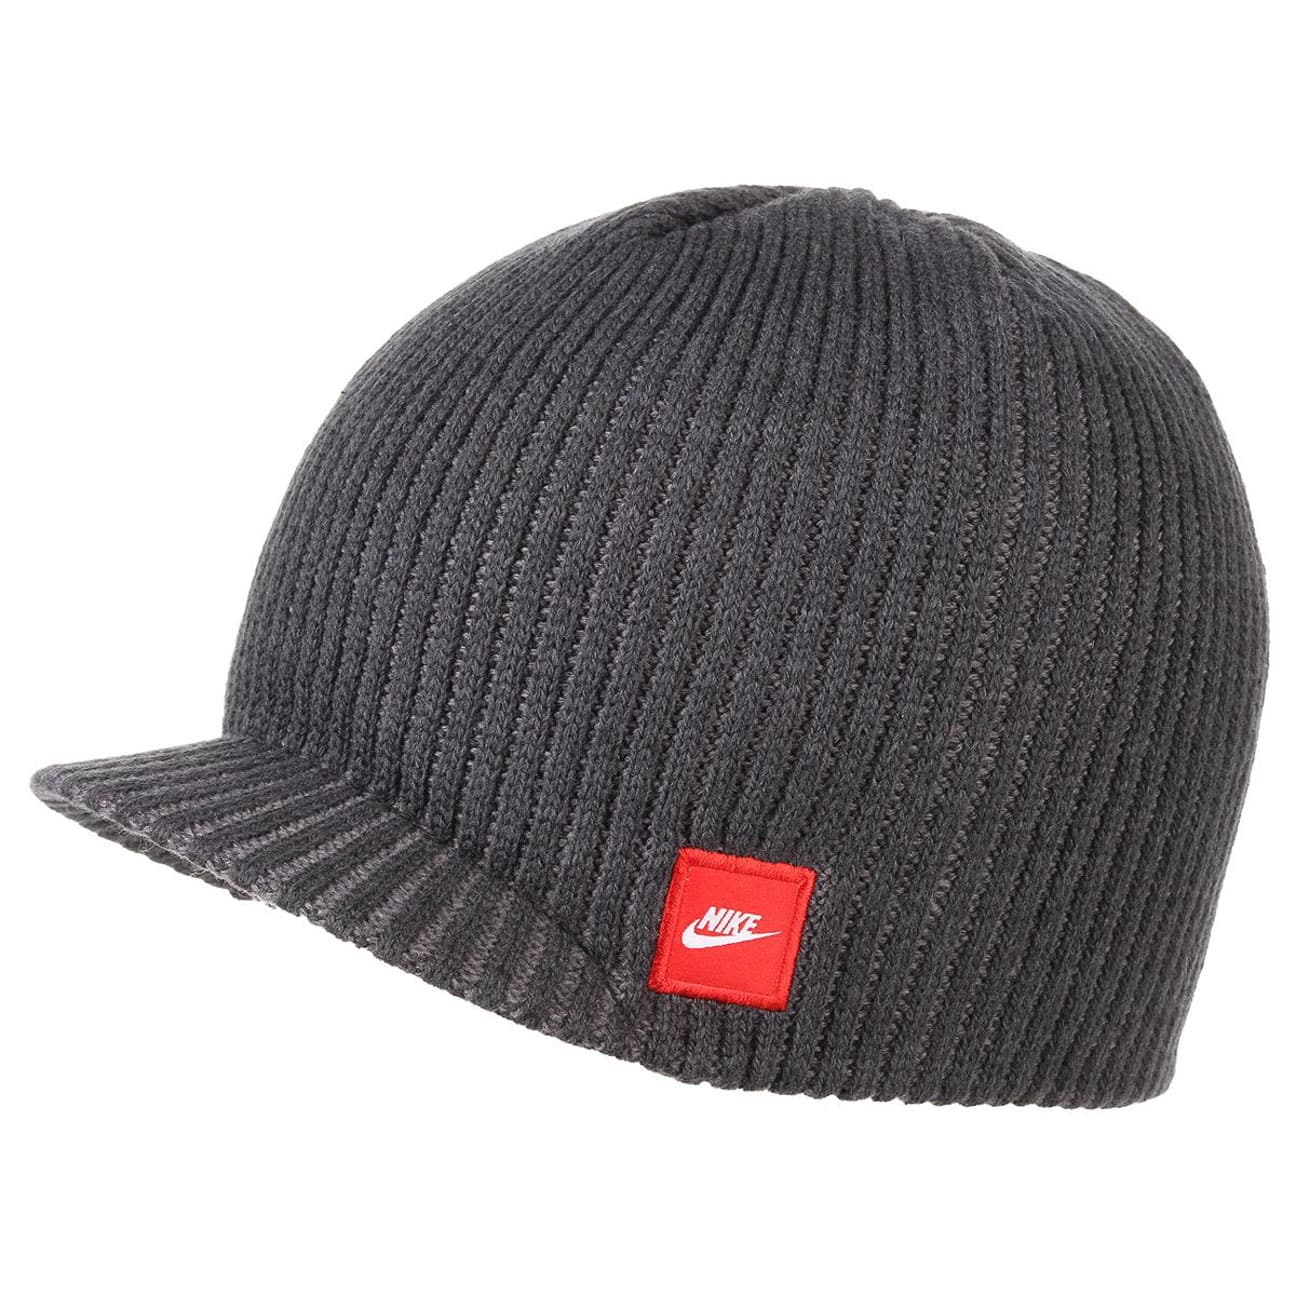 ce414d008a5 ... switzerland rib peak pull on hat by nike grey 1 84d17 44737